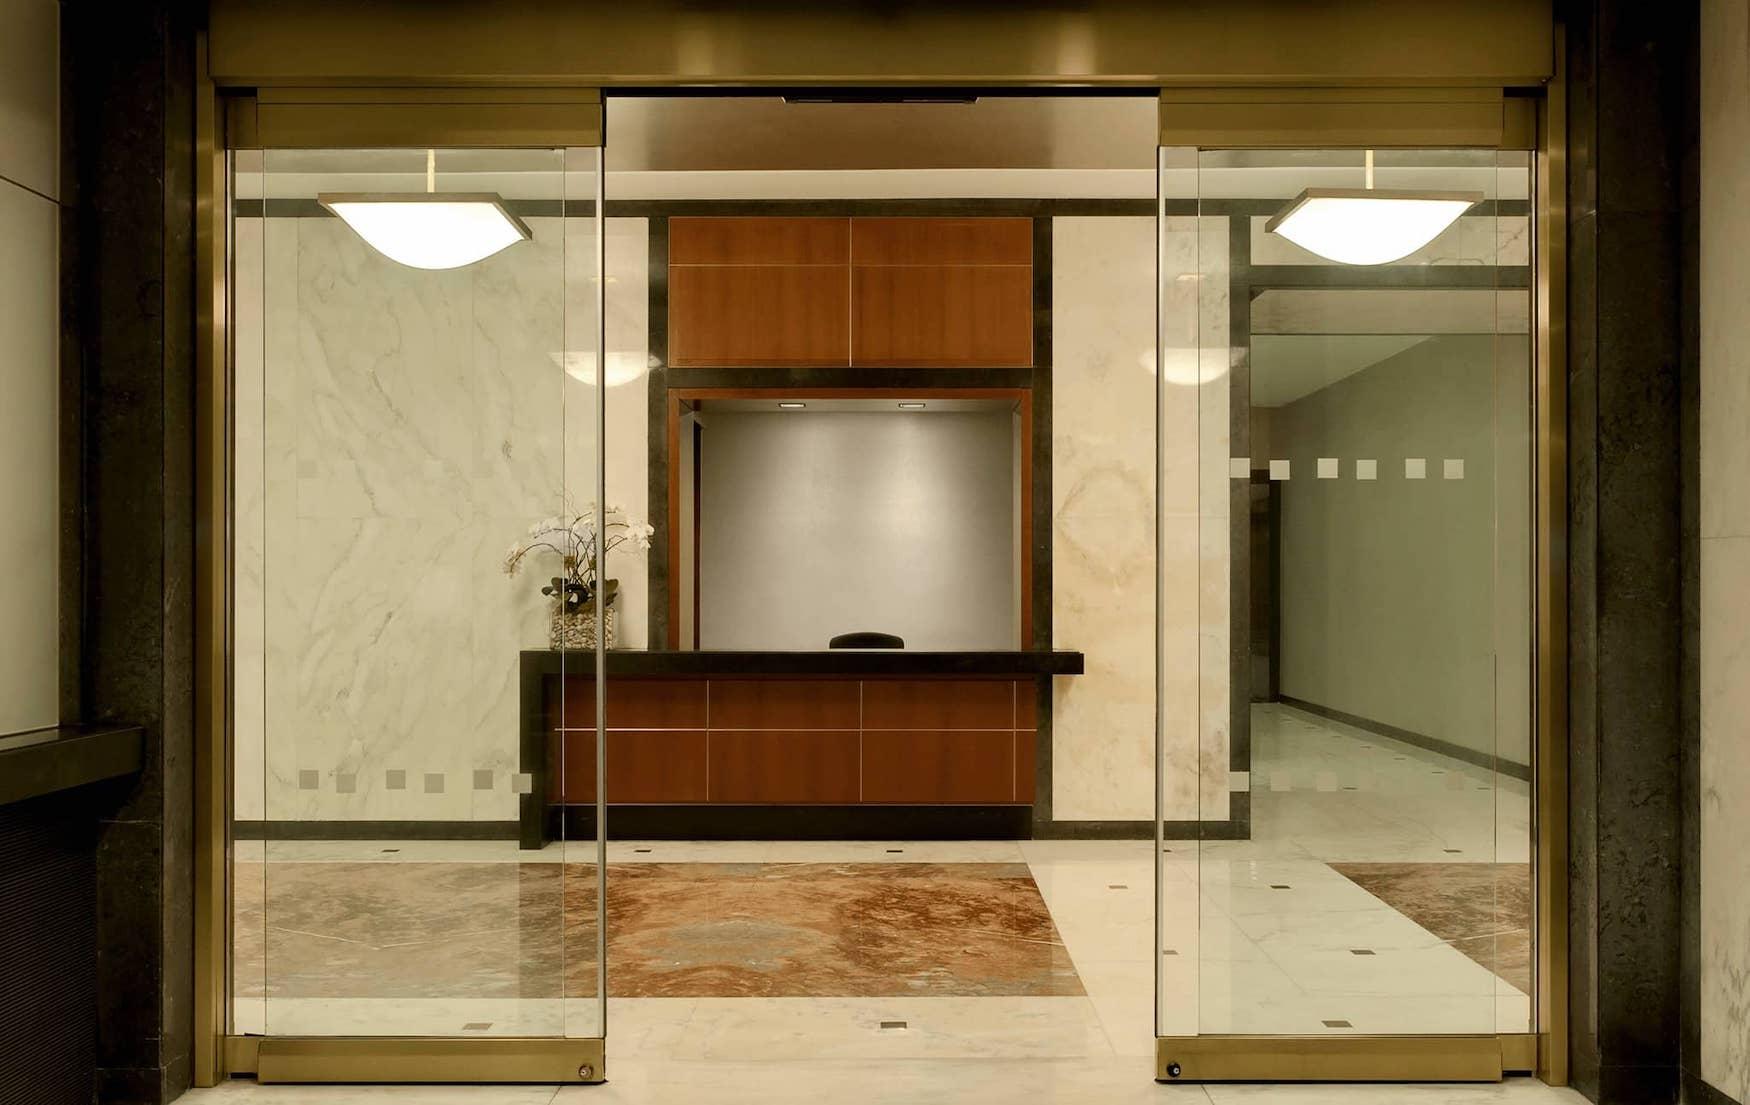 Concierge desk at 35 East 85th Street